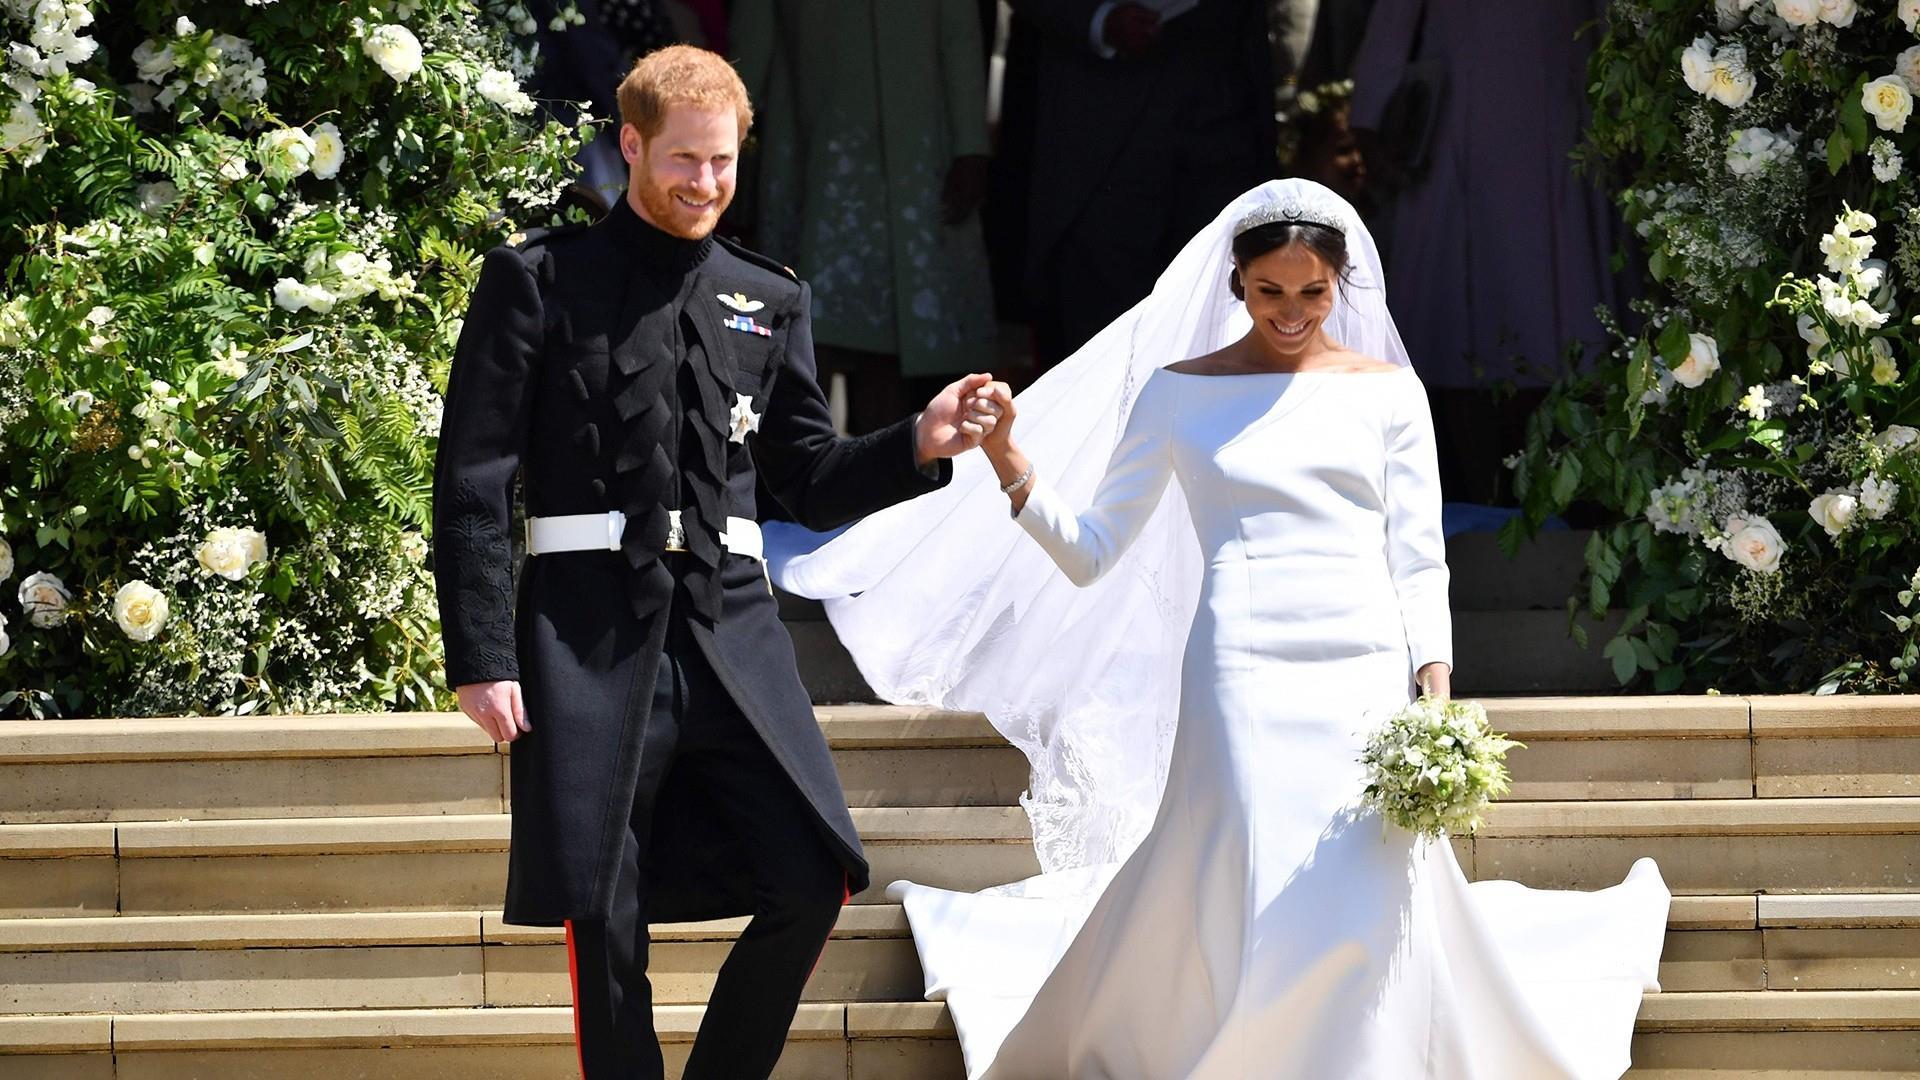 Prince Harry, Meghan Markle mark 1st anniversary with new wedding photos